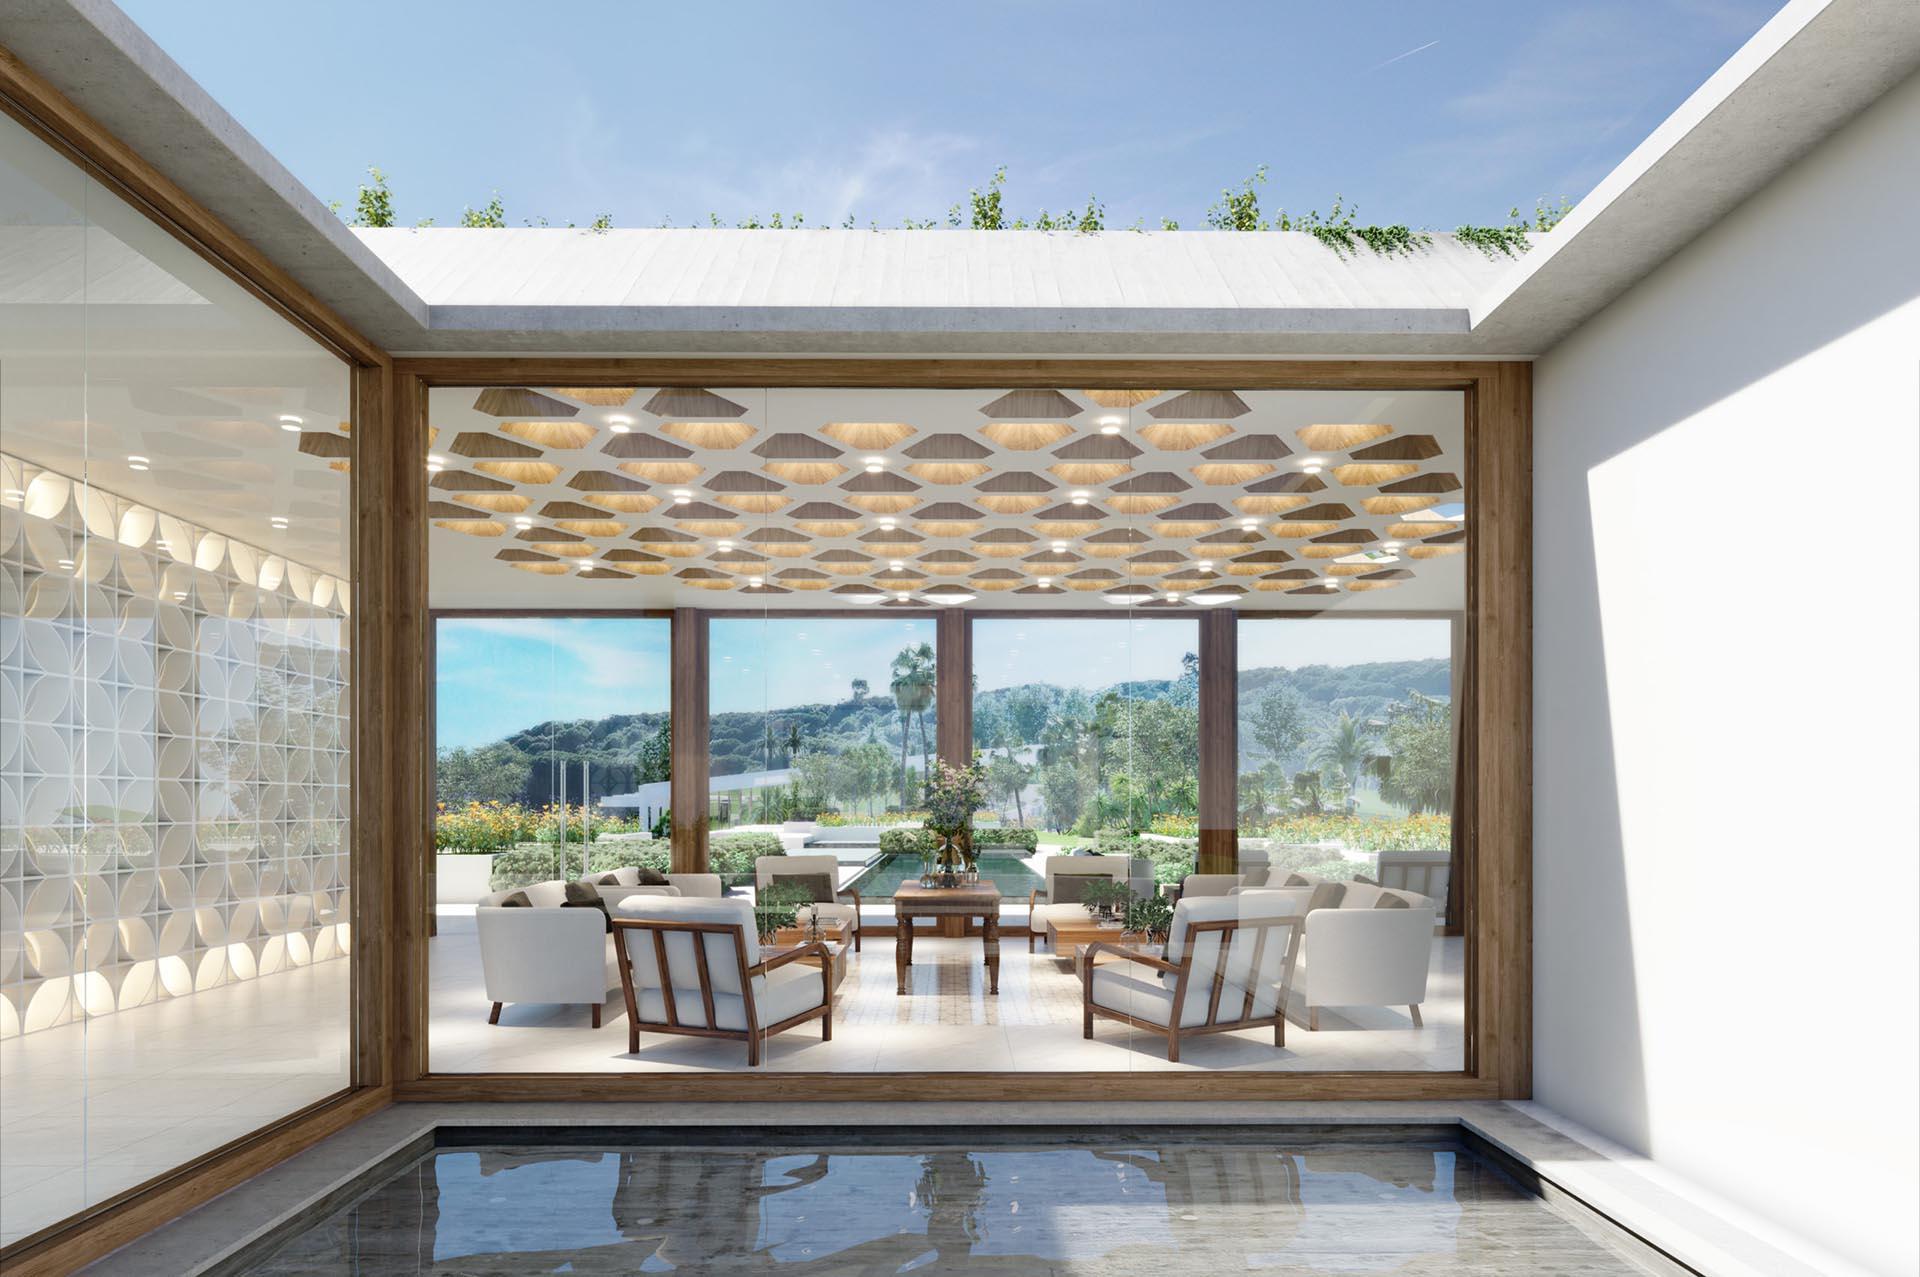 so-sotogrande-accor-new-luxury-hotel-noll-real-estate-blog-2020